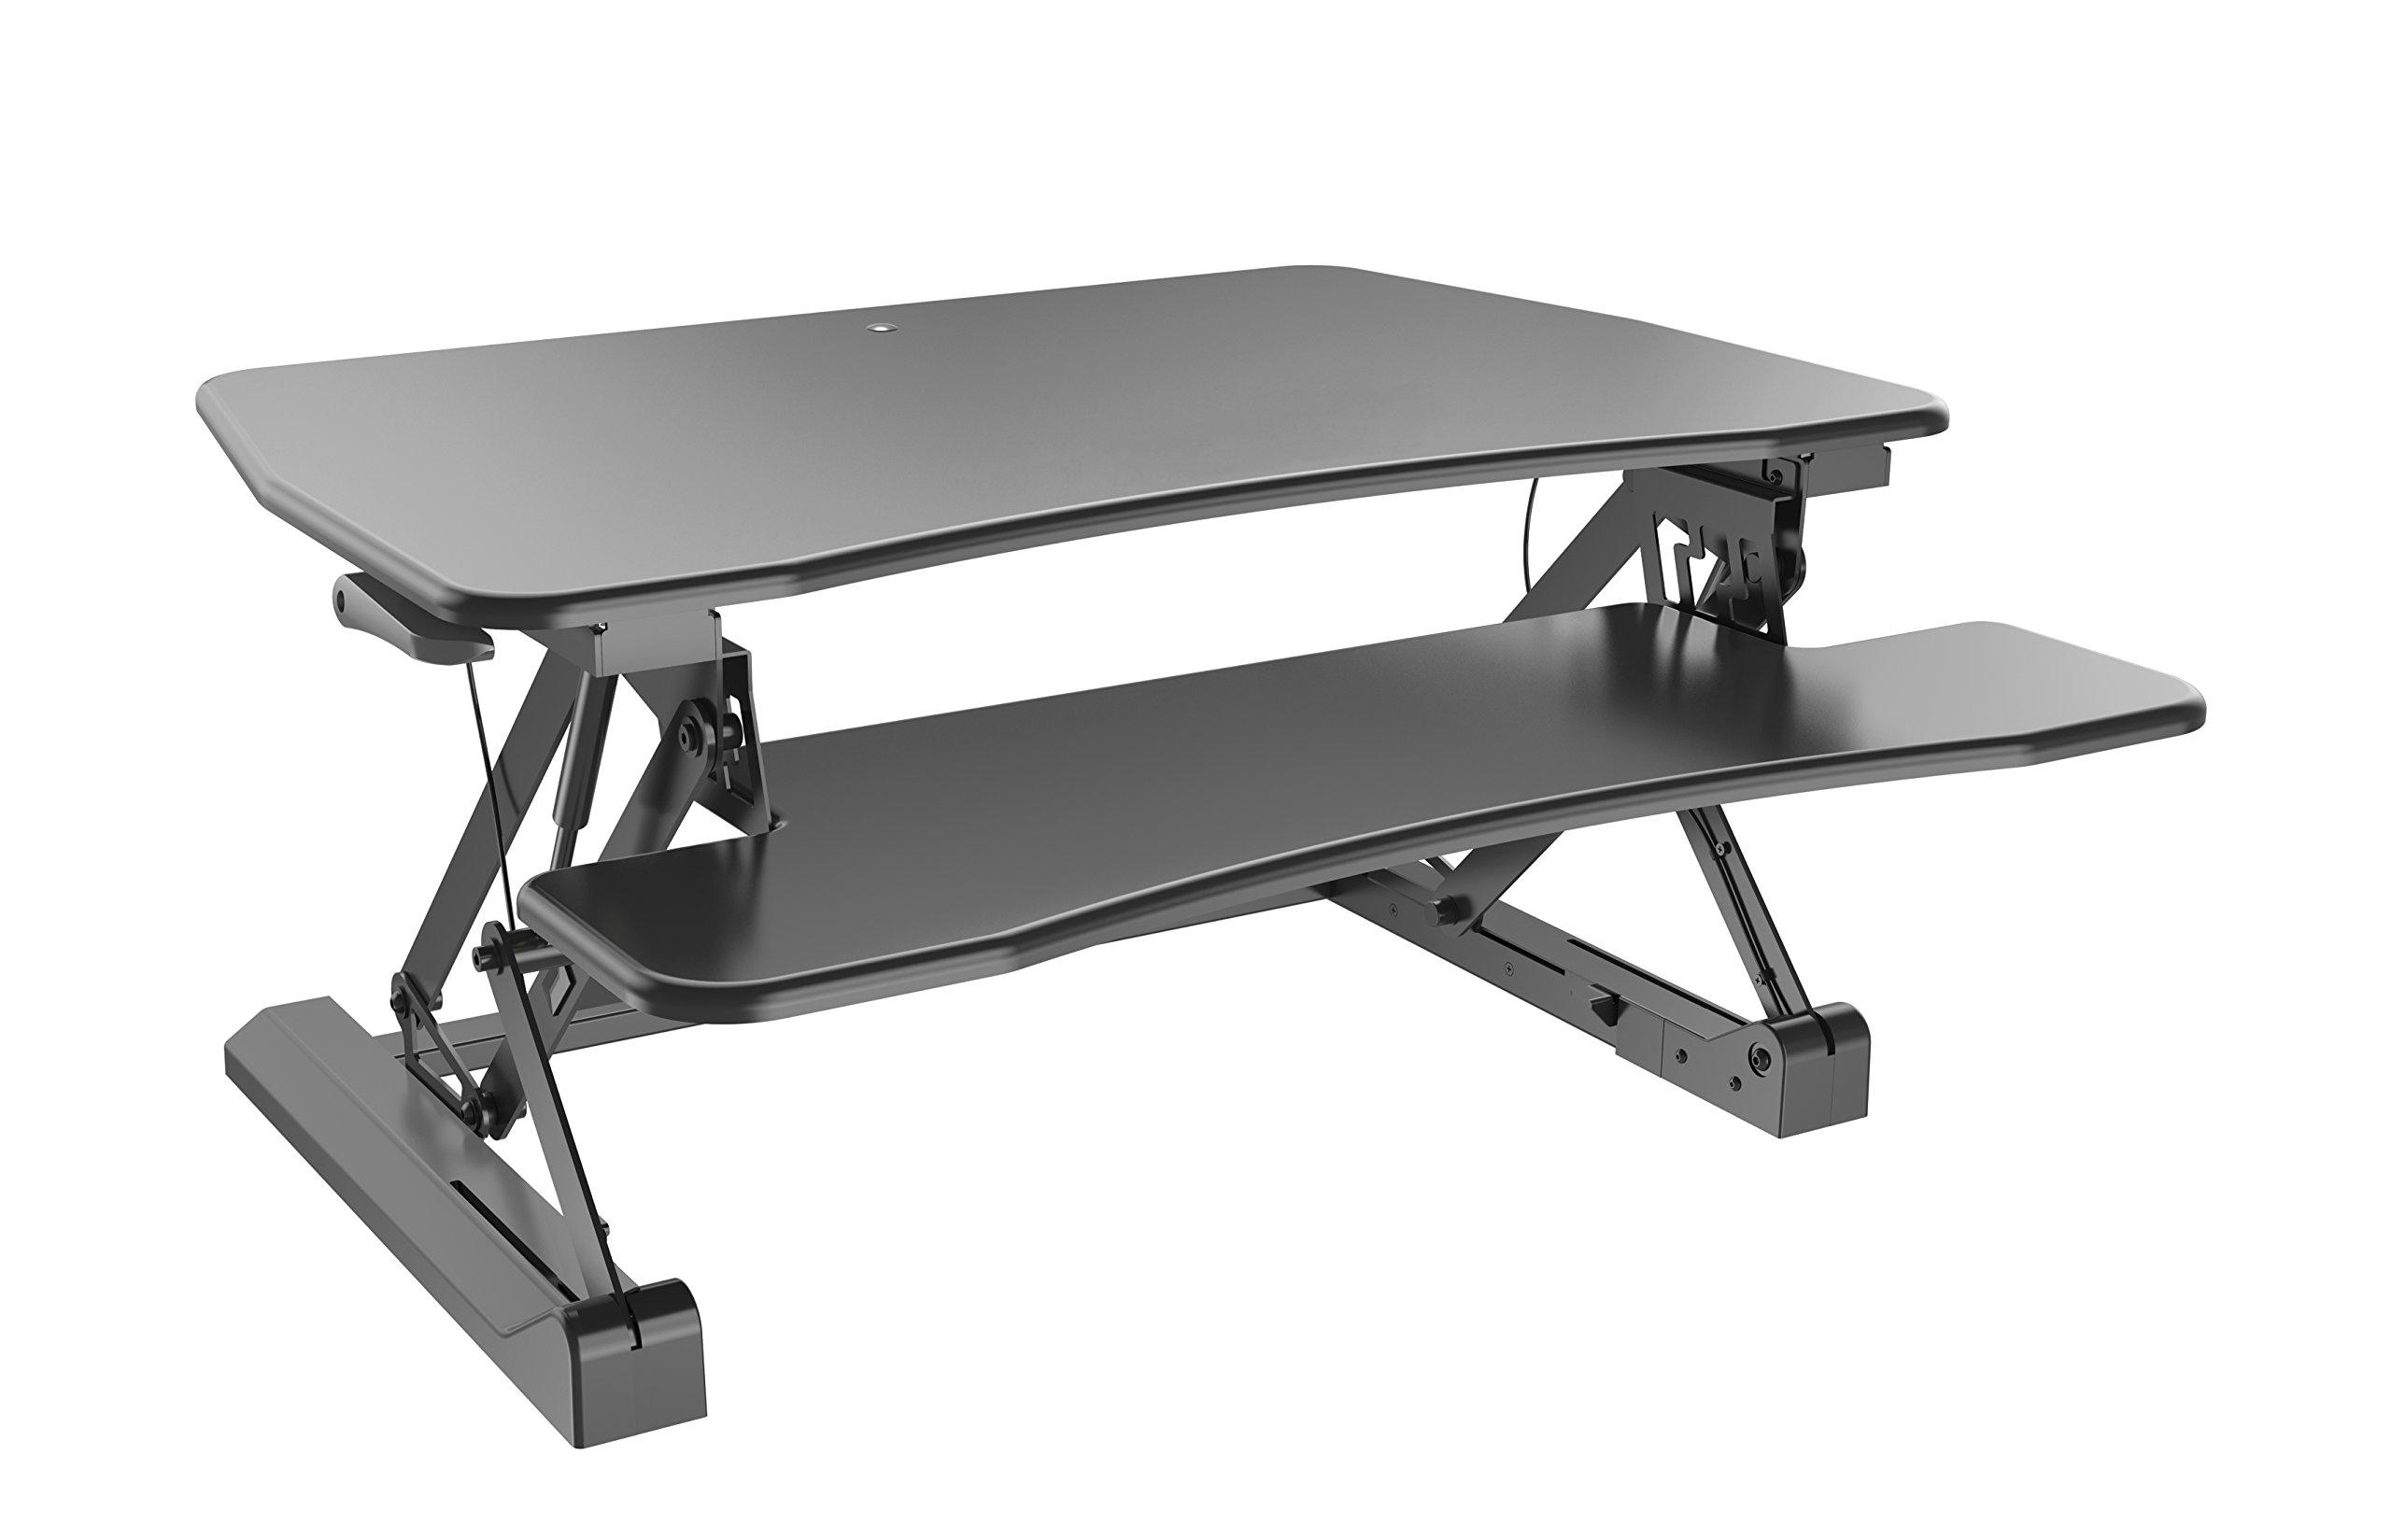 Symmetry Office High Tide 3 Sit-Stand Desktop Workstation (Minor Assembly)